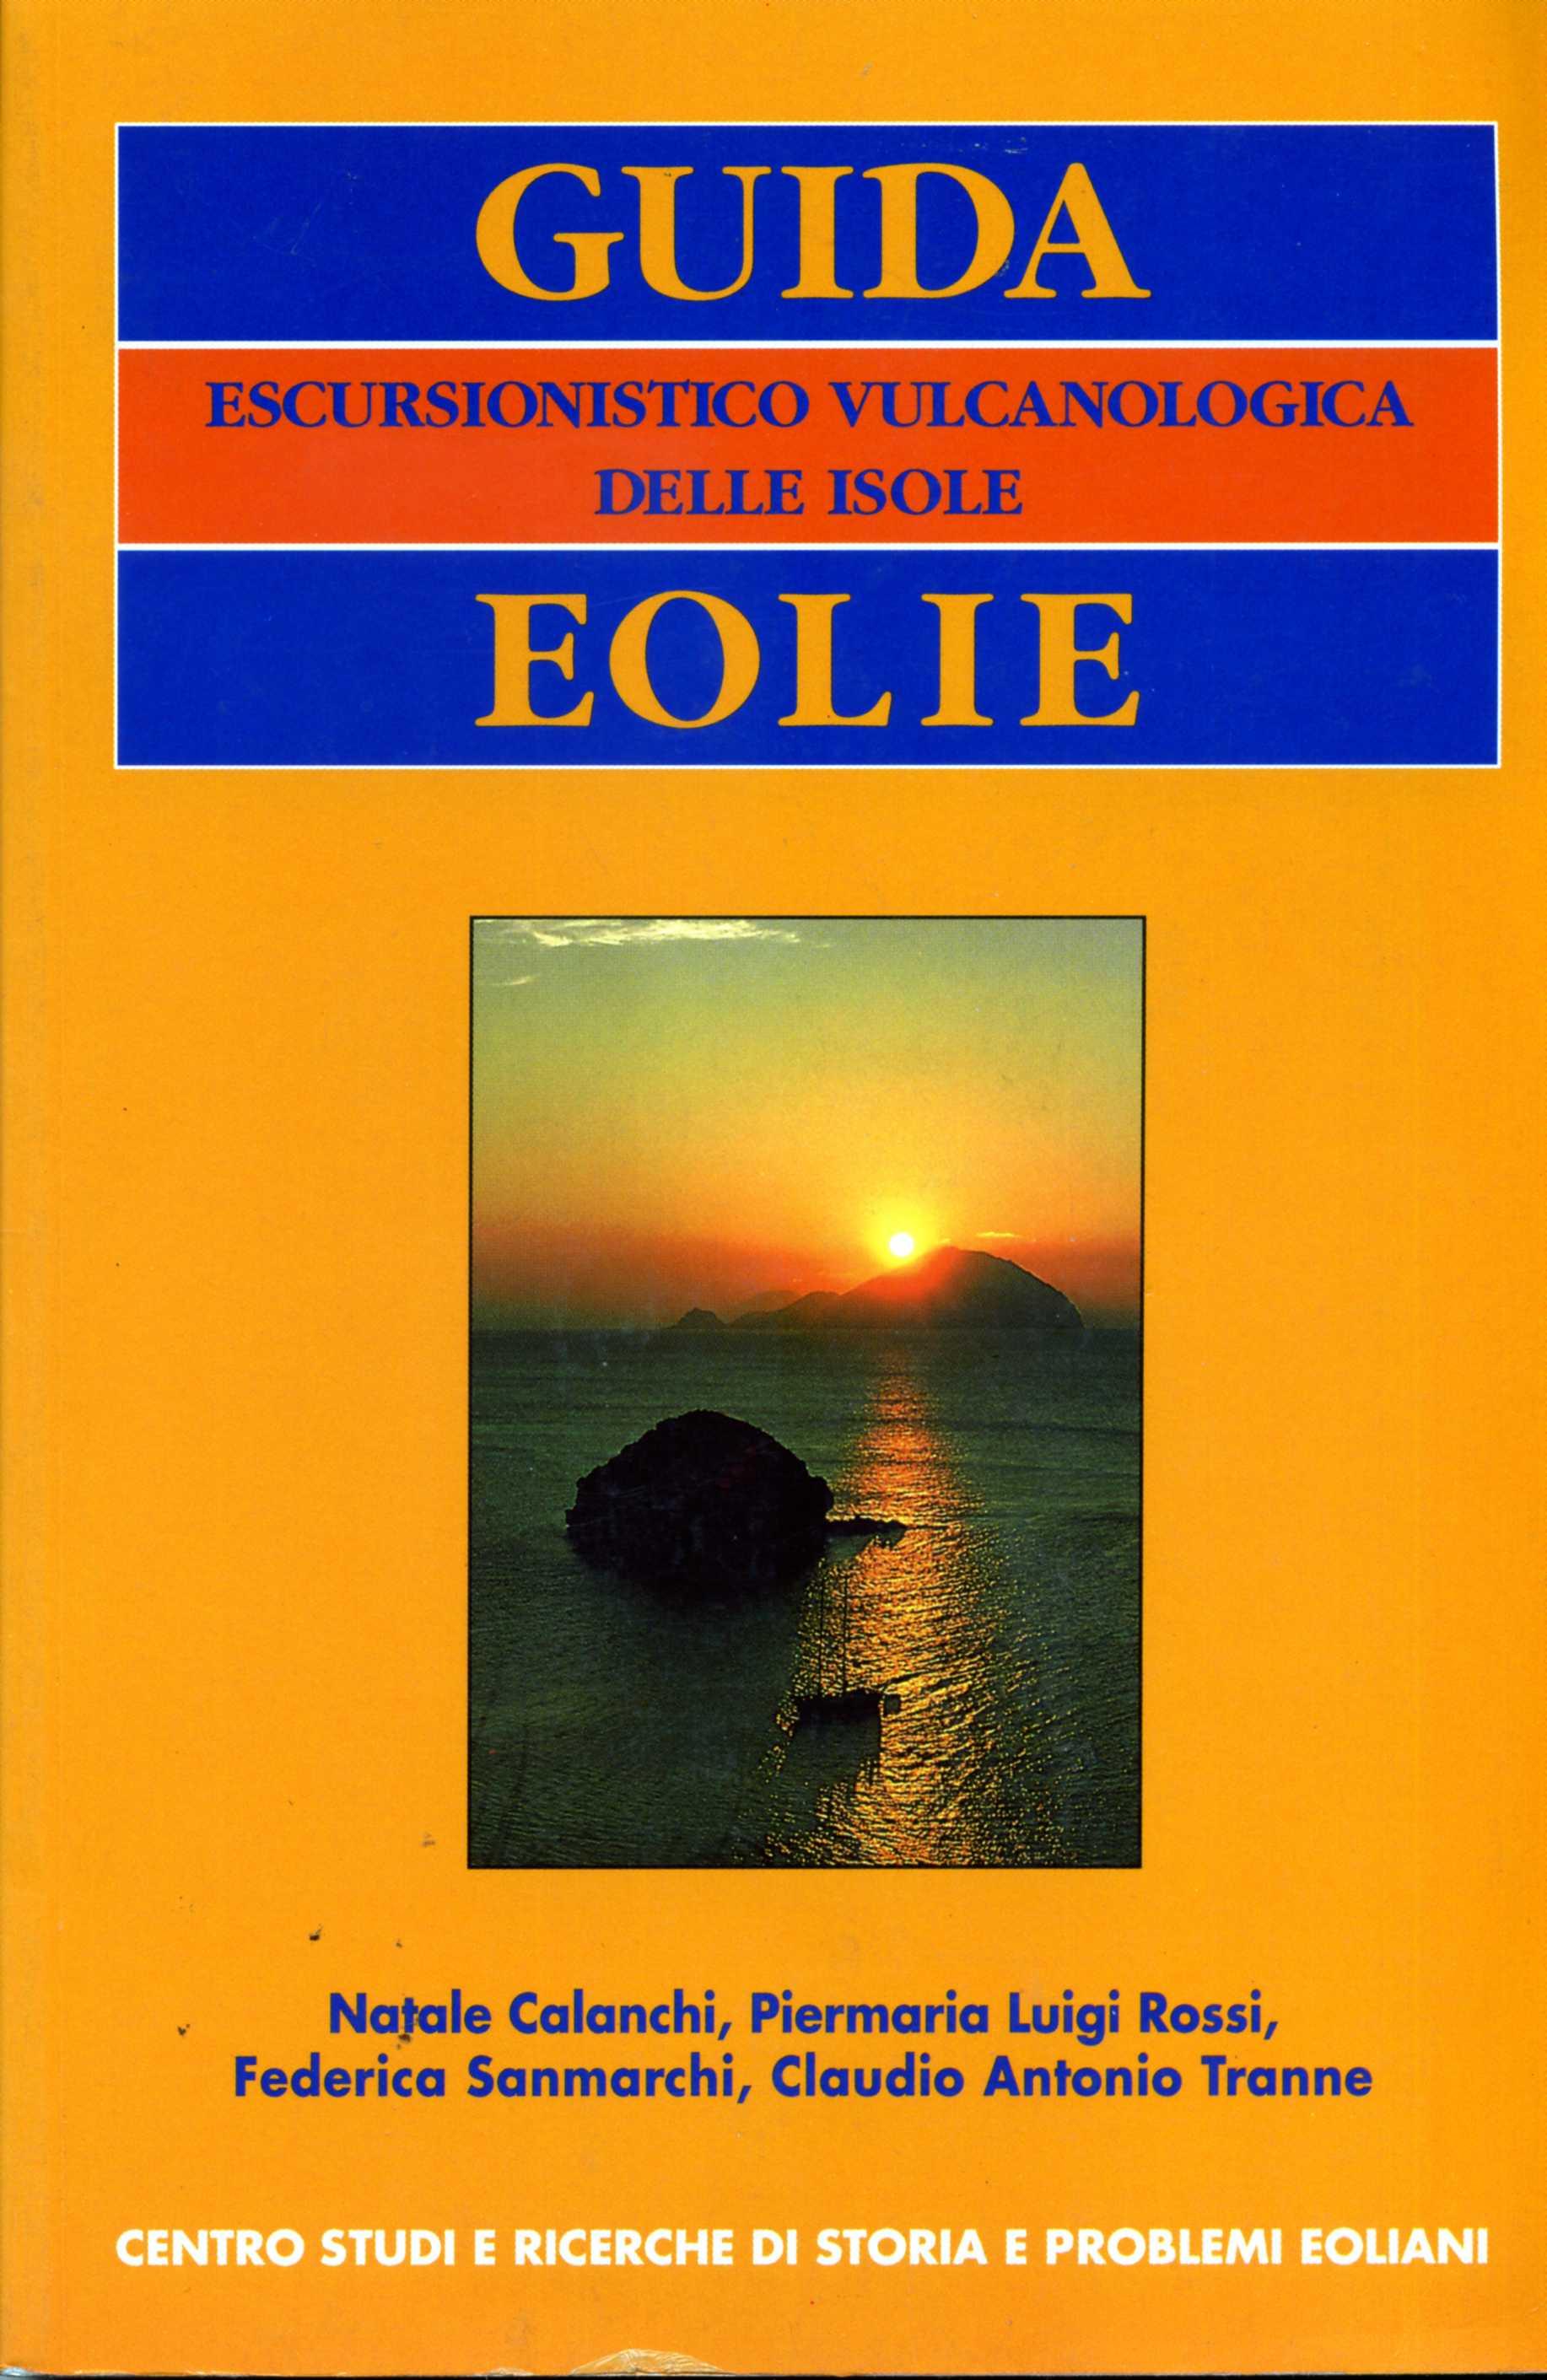 Guida naturalistica alle isole Eolie